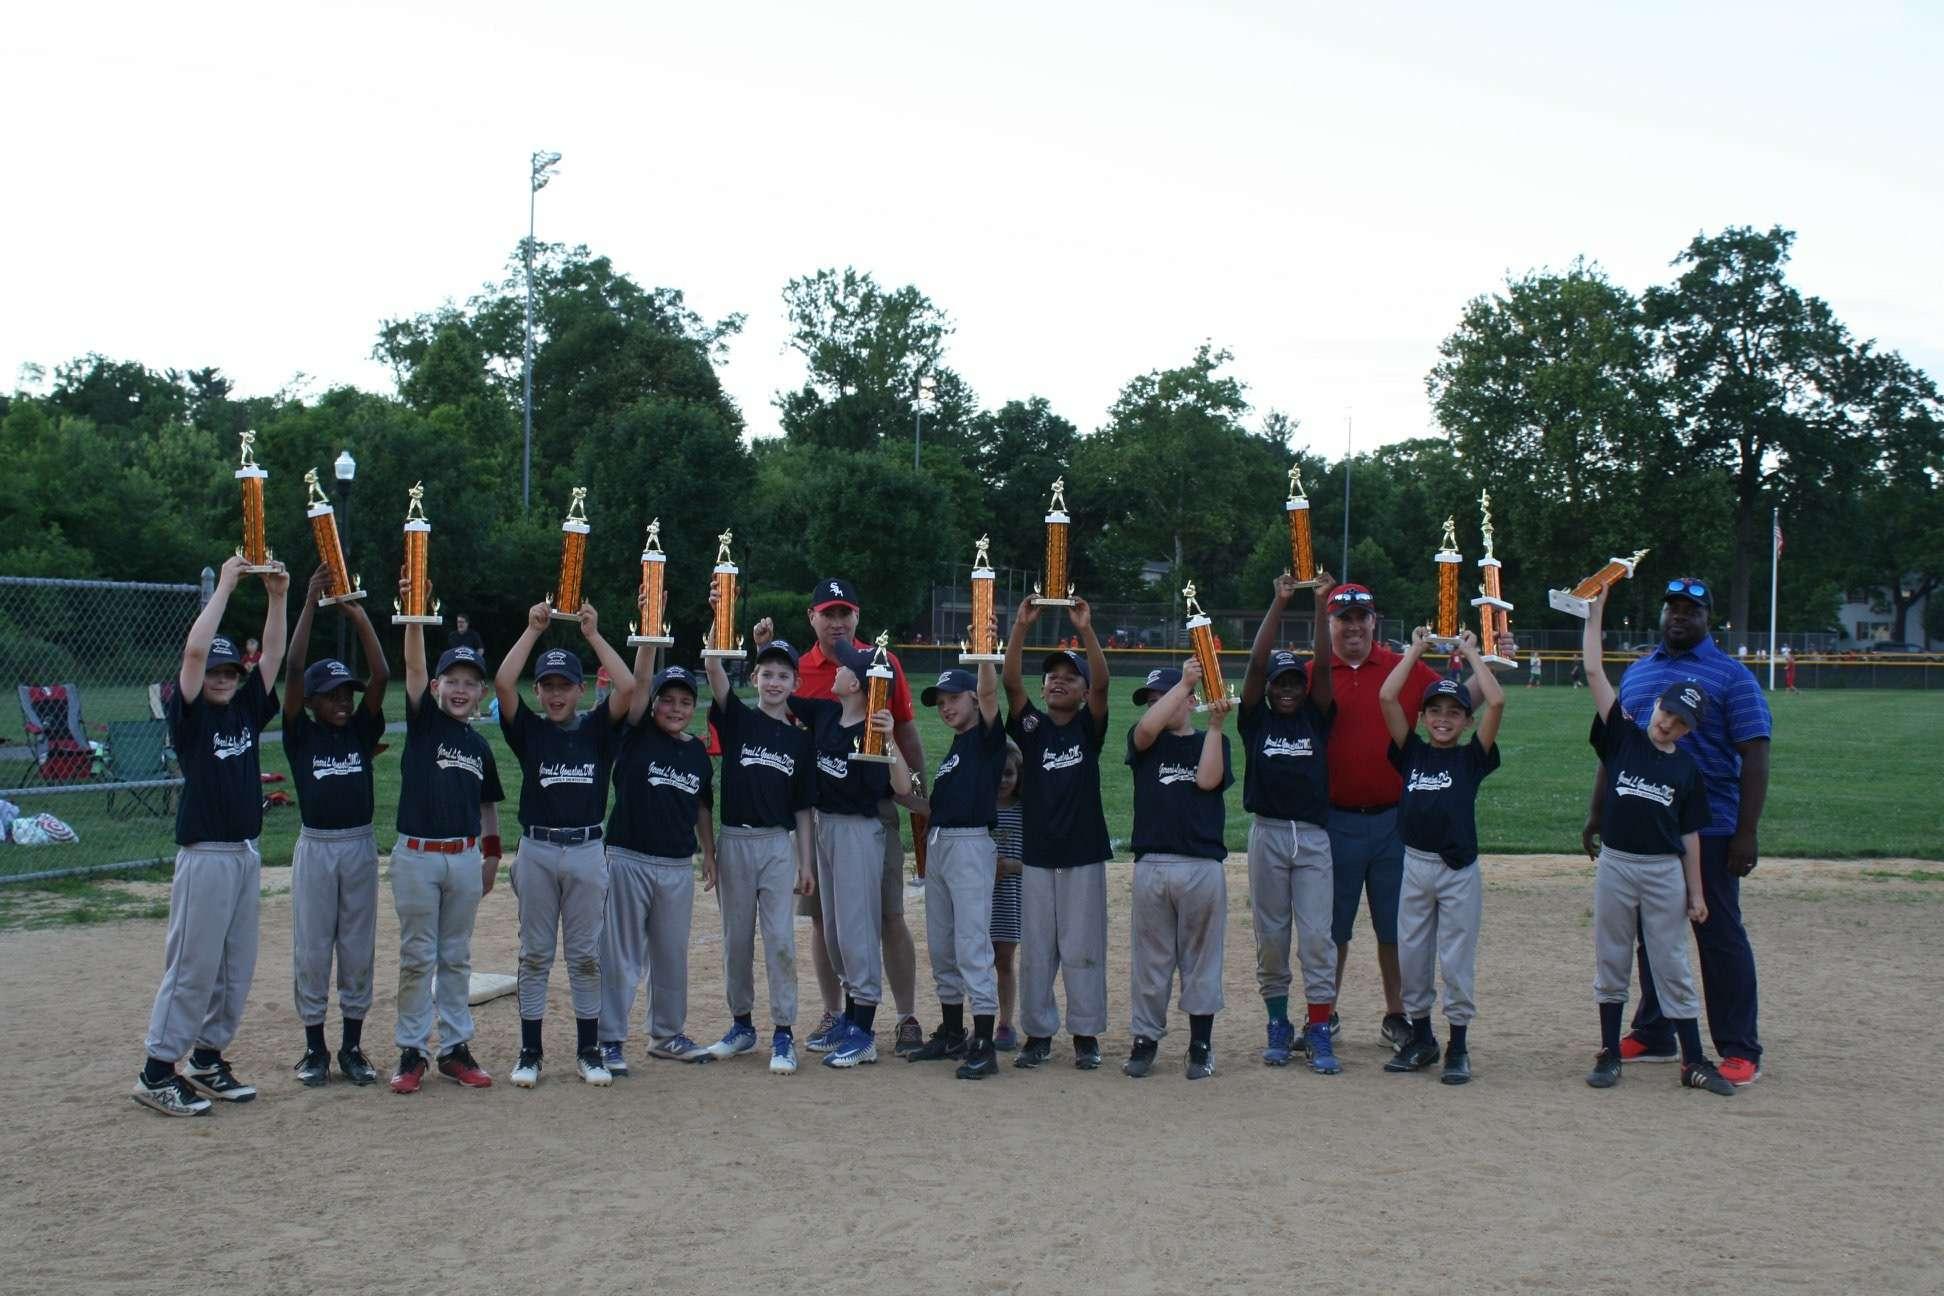 2018 Minors Champions